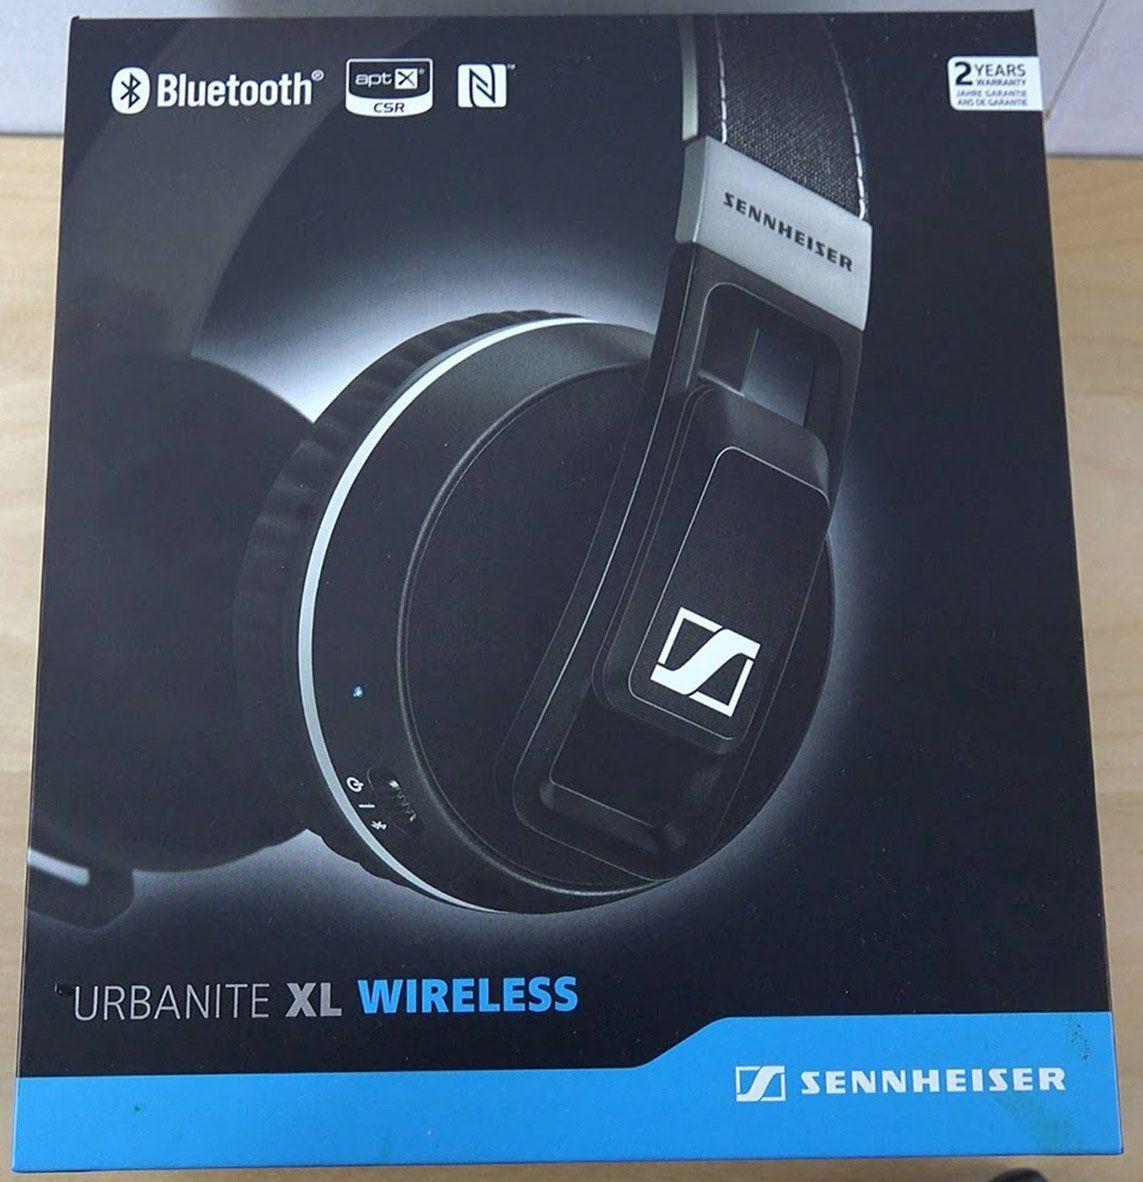 Sennheiser Urbanite XL Fone de ouvido sem fio fechado UrbaniteXL